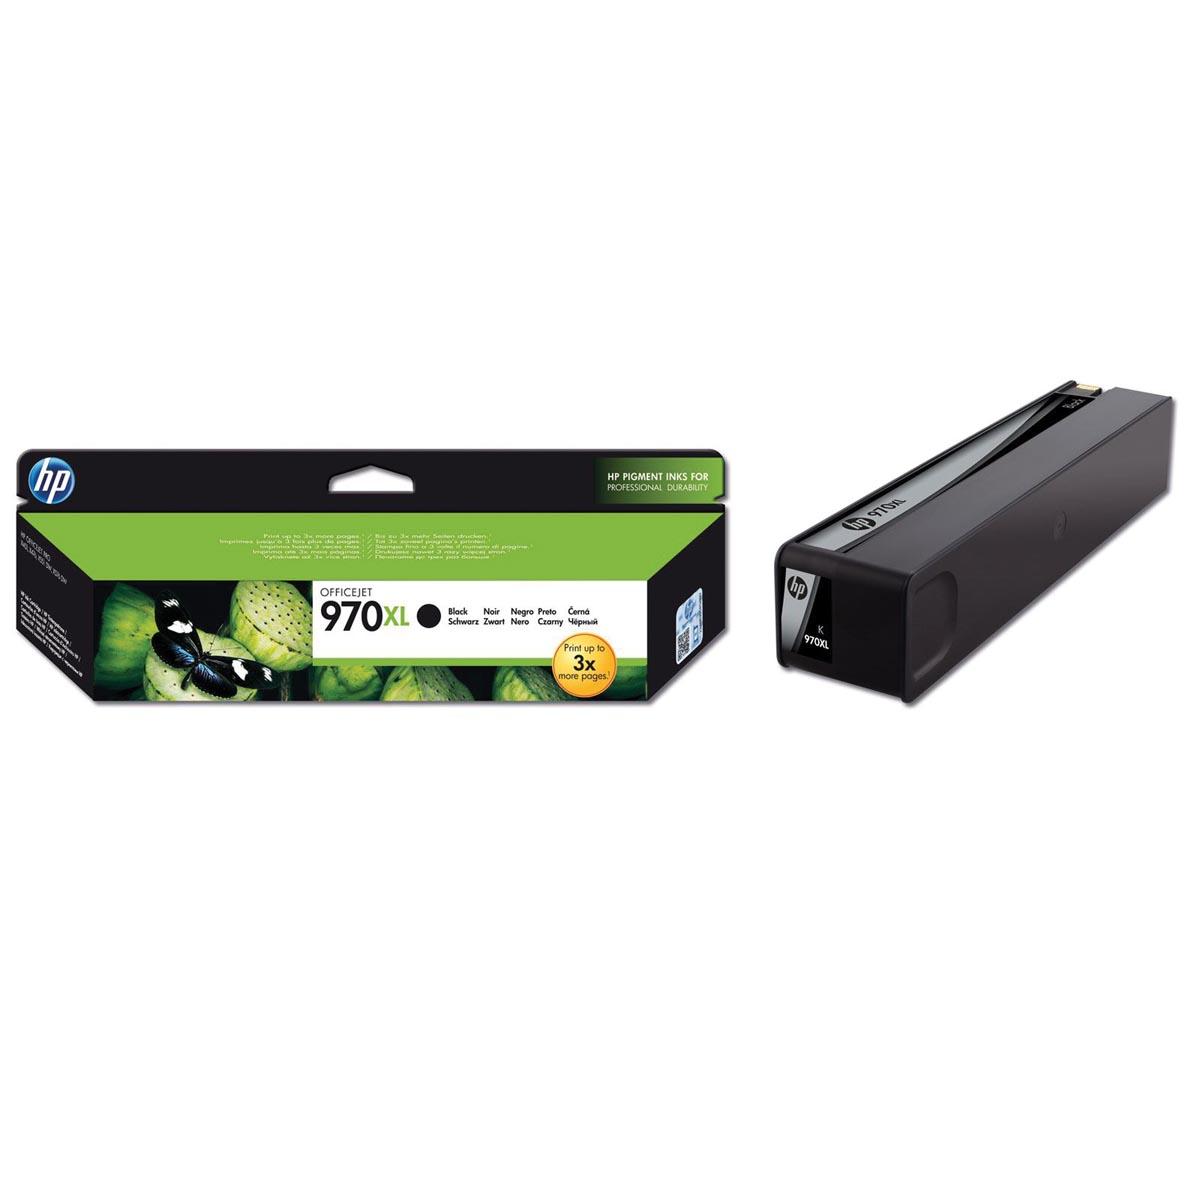 HP inktcartridge 970XL, 9 200 paginas, OEM CN625AE, zwart